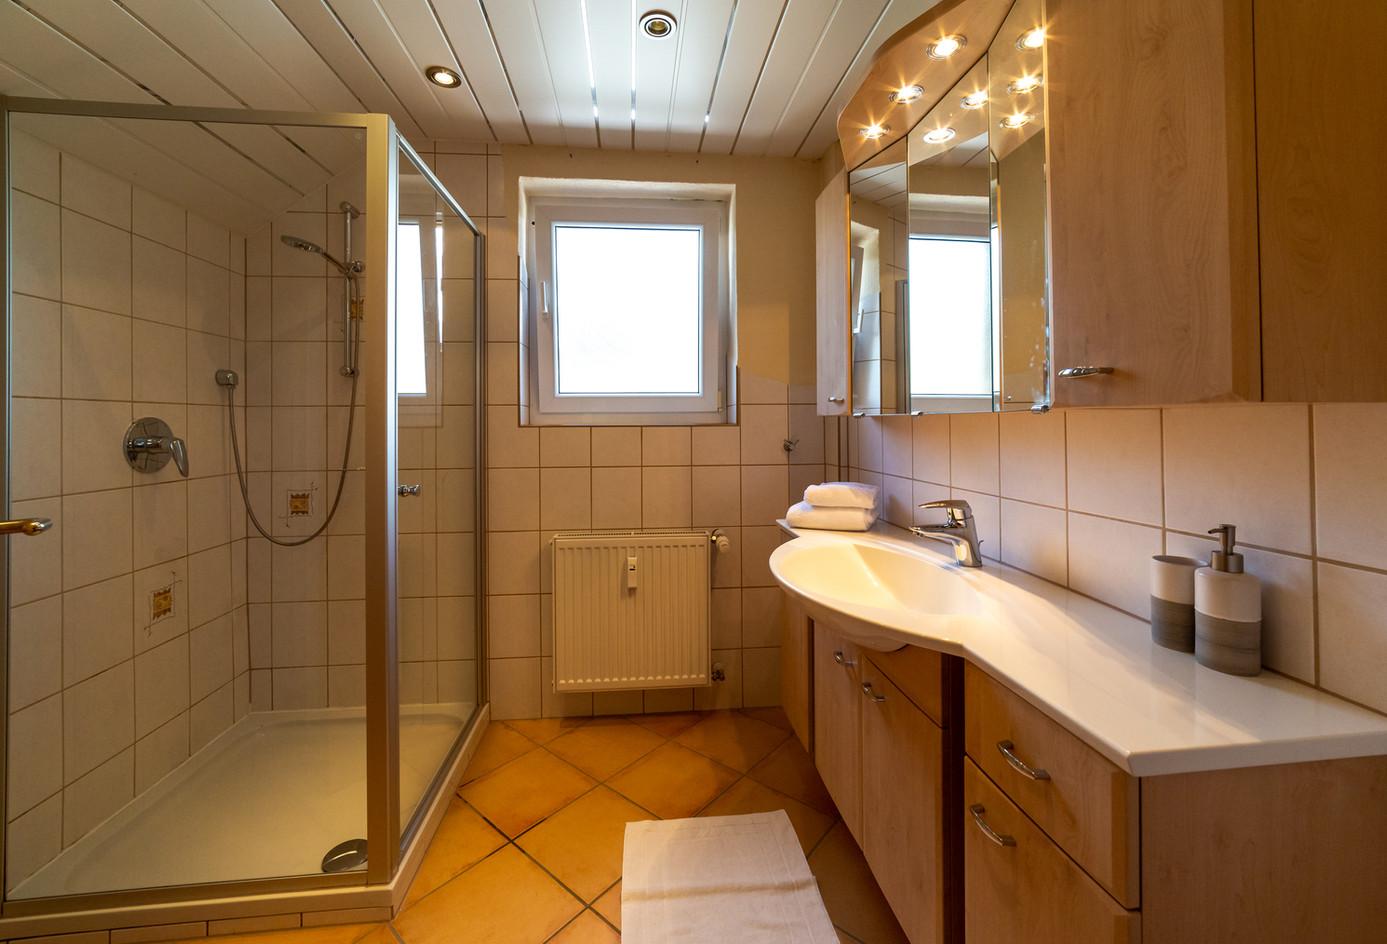 schneehaus kristal site bathroom 2.jpg